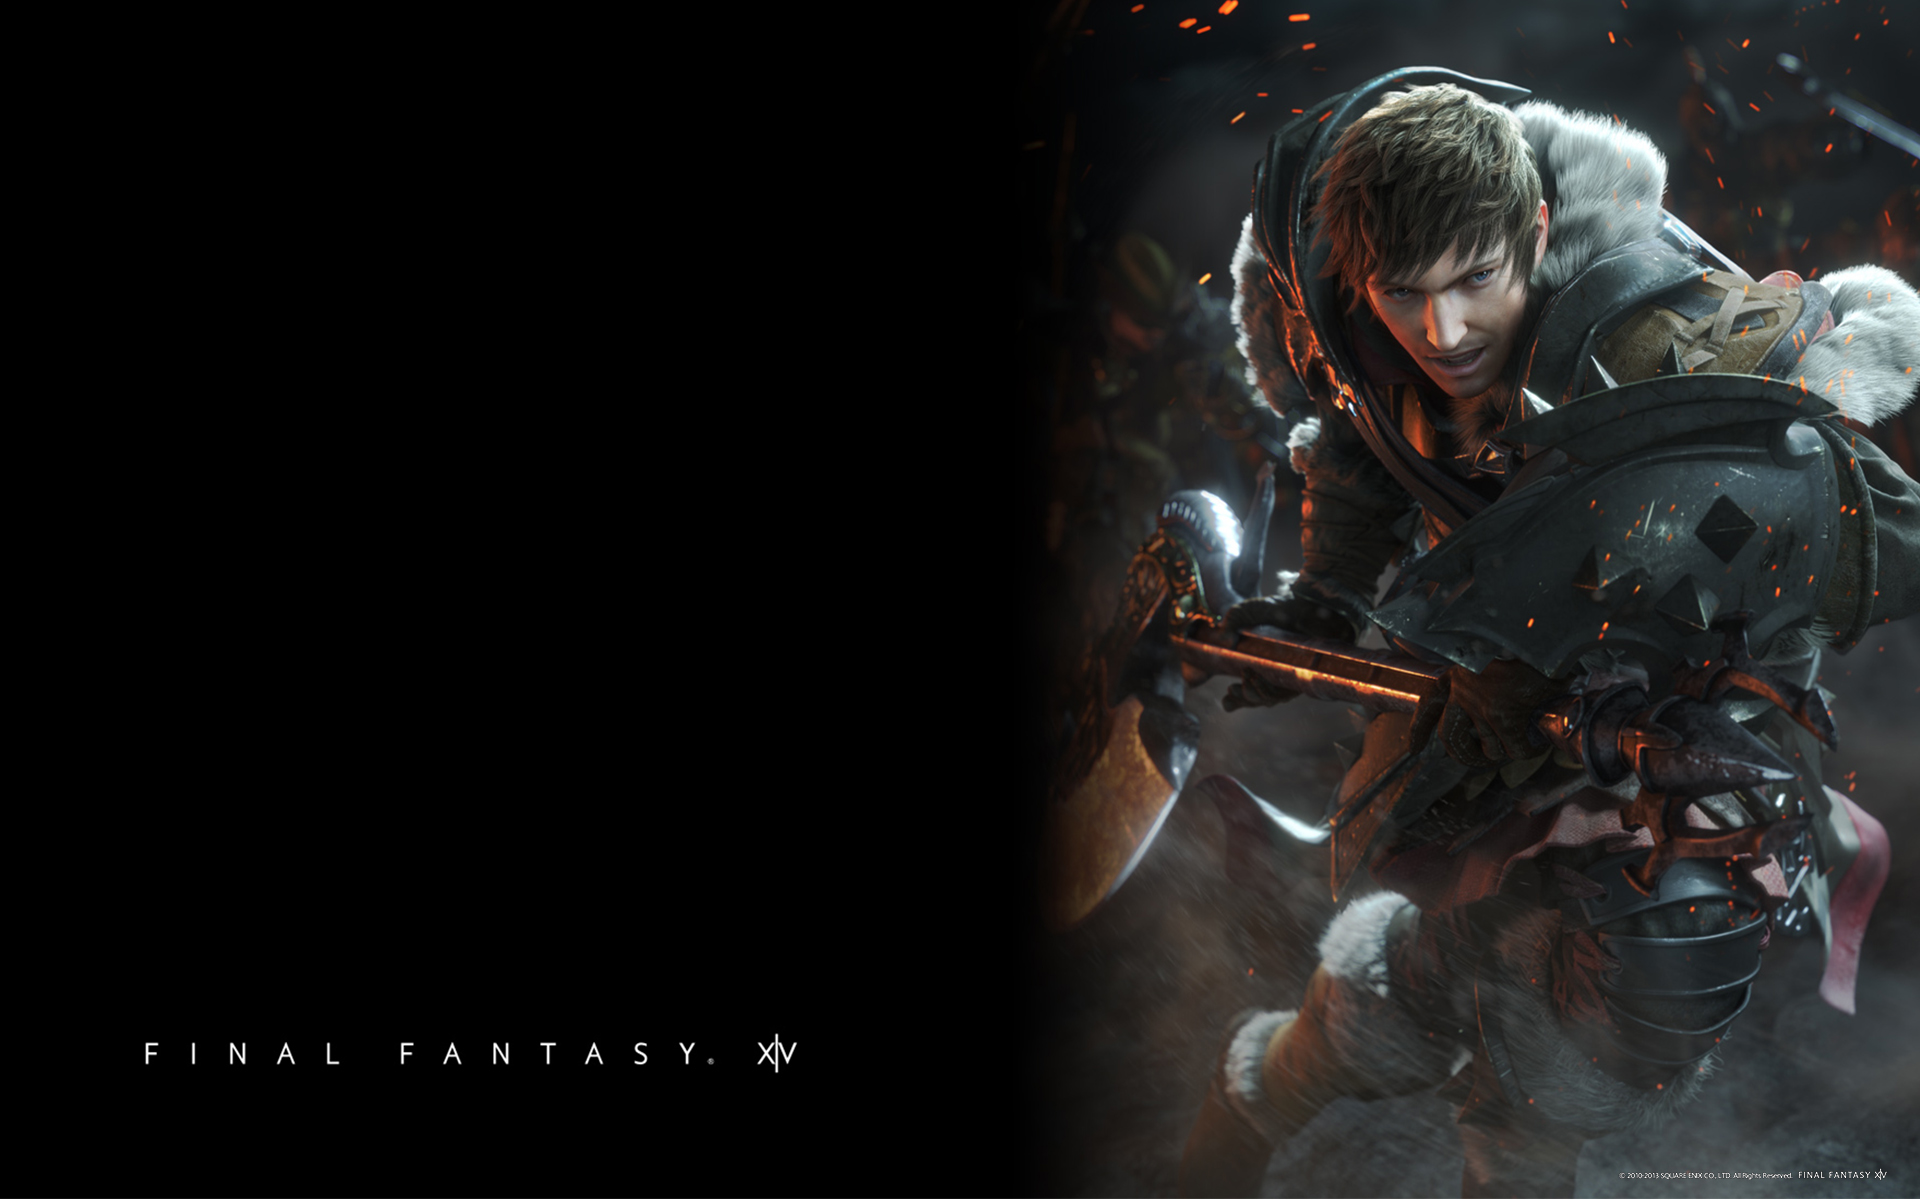 49 final fantasy 15 1080p wallpaper on wallpapersafari - Ffxiv wallpaper 1080p ...